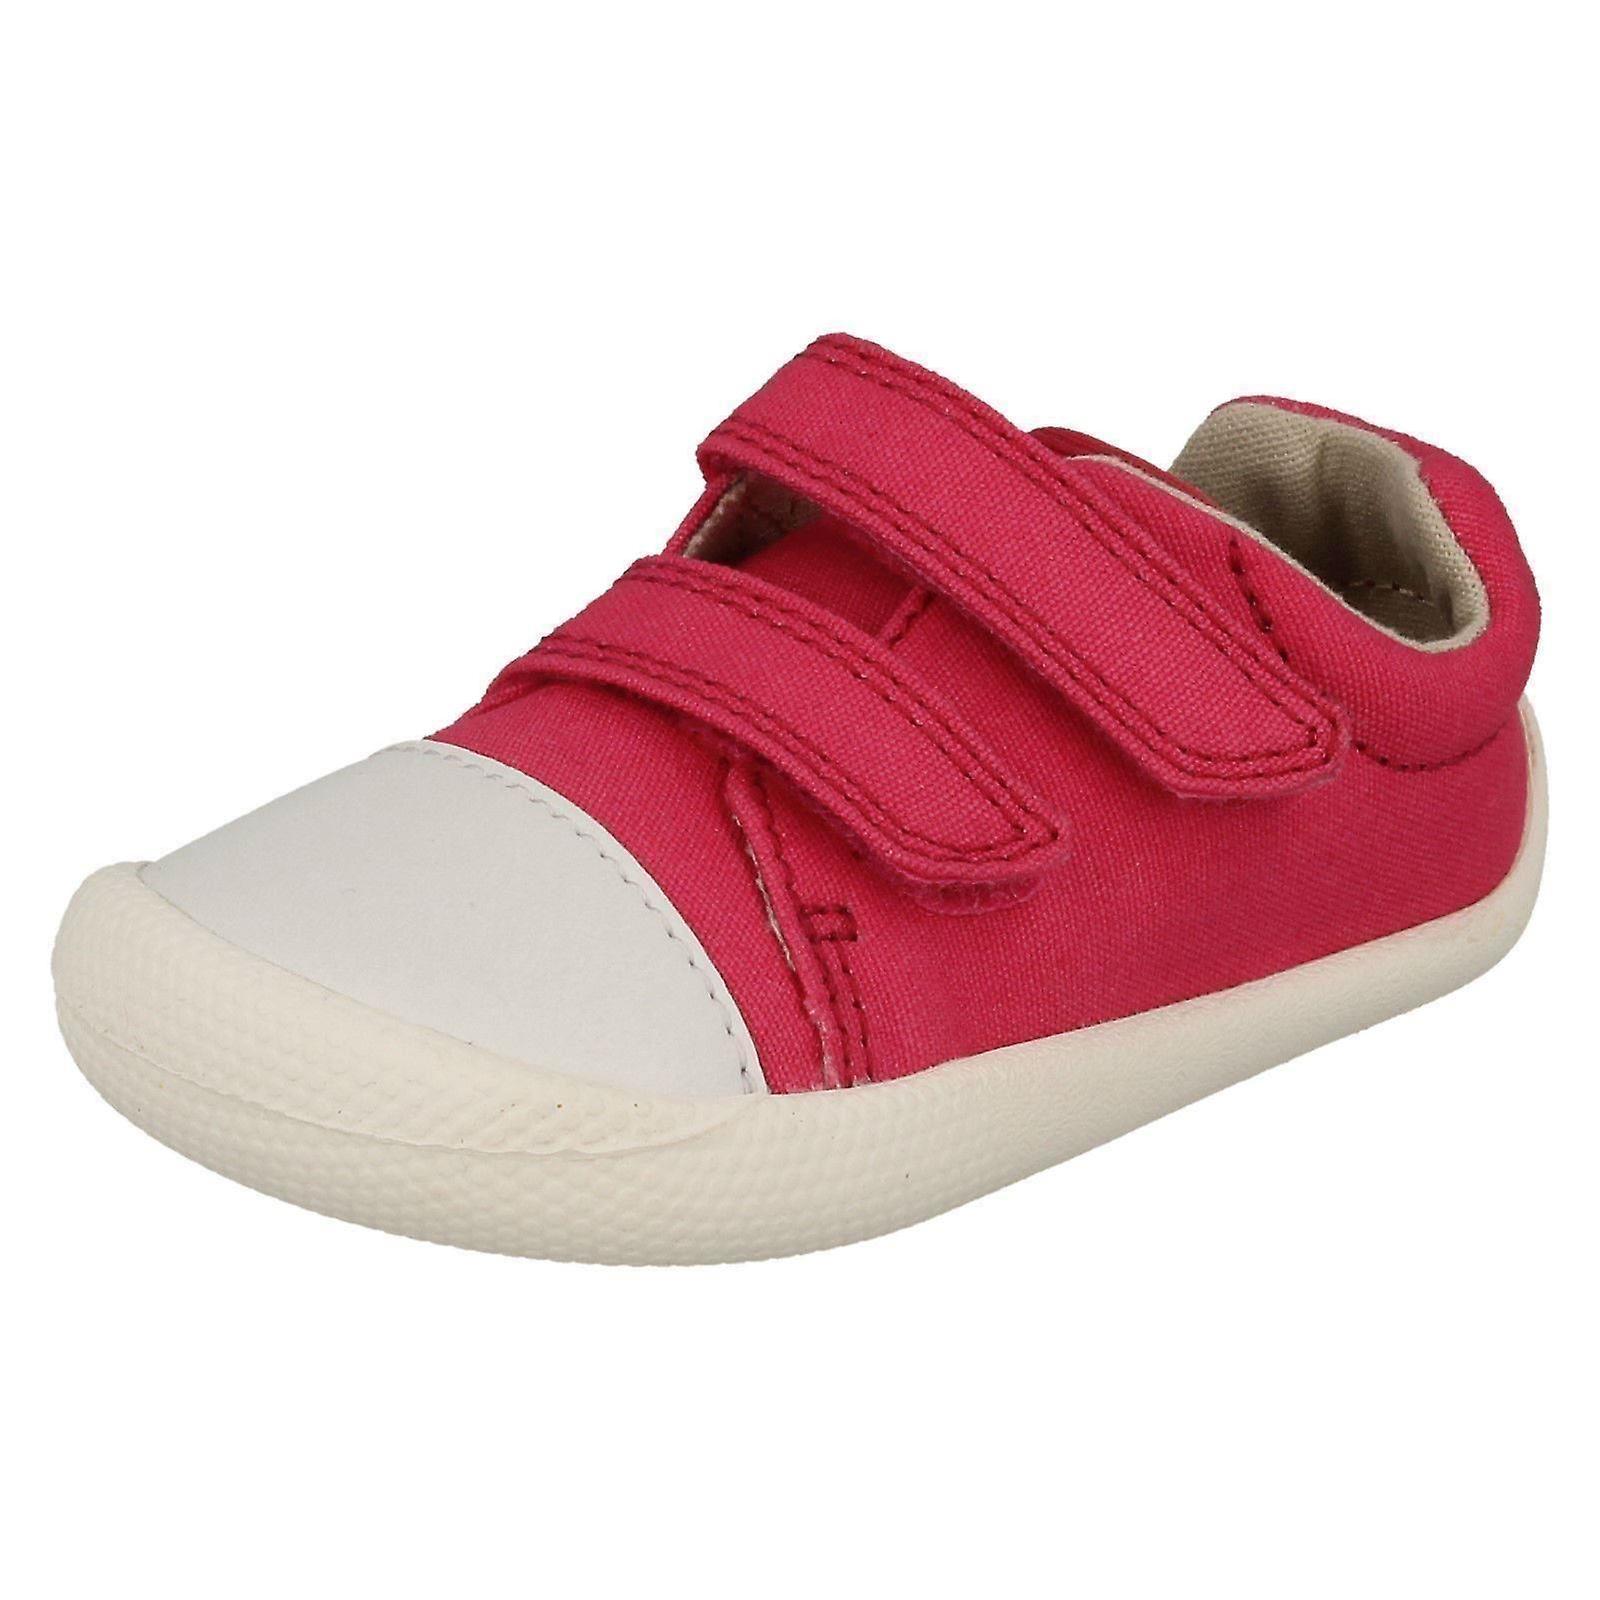 Girls Treasure<Minimum<Men/Women Clarks Casual Shoes Tiny Treasure<Minimum<Men/Women Girls fbd566